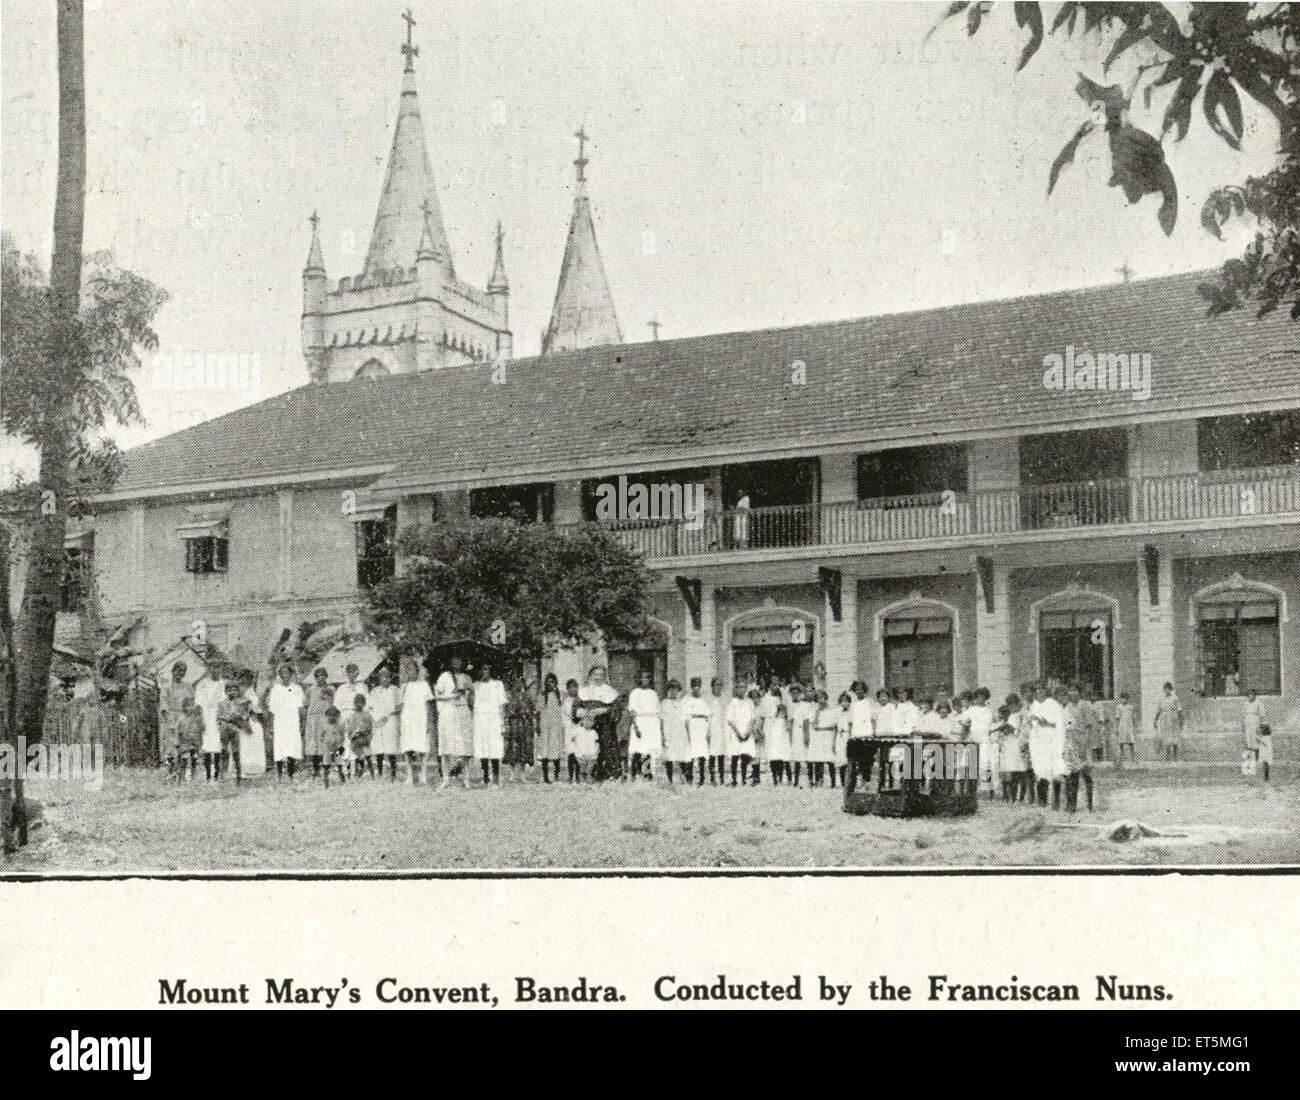 Marias Kloster Bandra Verhalten von Franziskaner Nonnen zu montieren; Bombay Mumbai; Maharashtra; Indien Stockbild